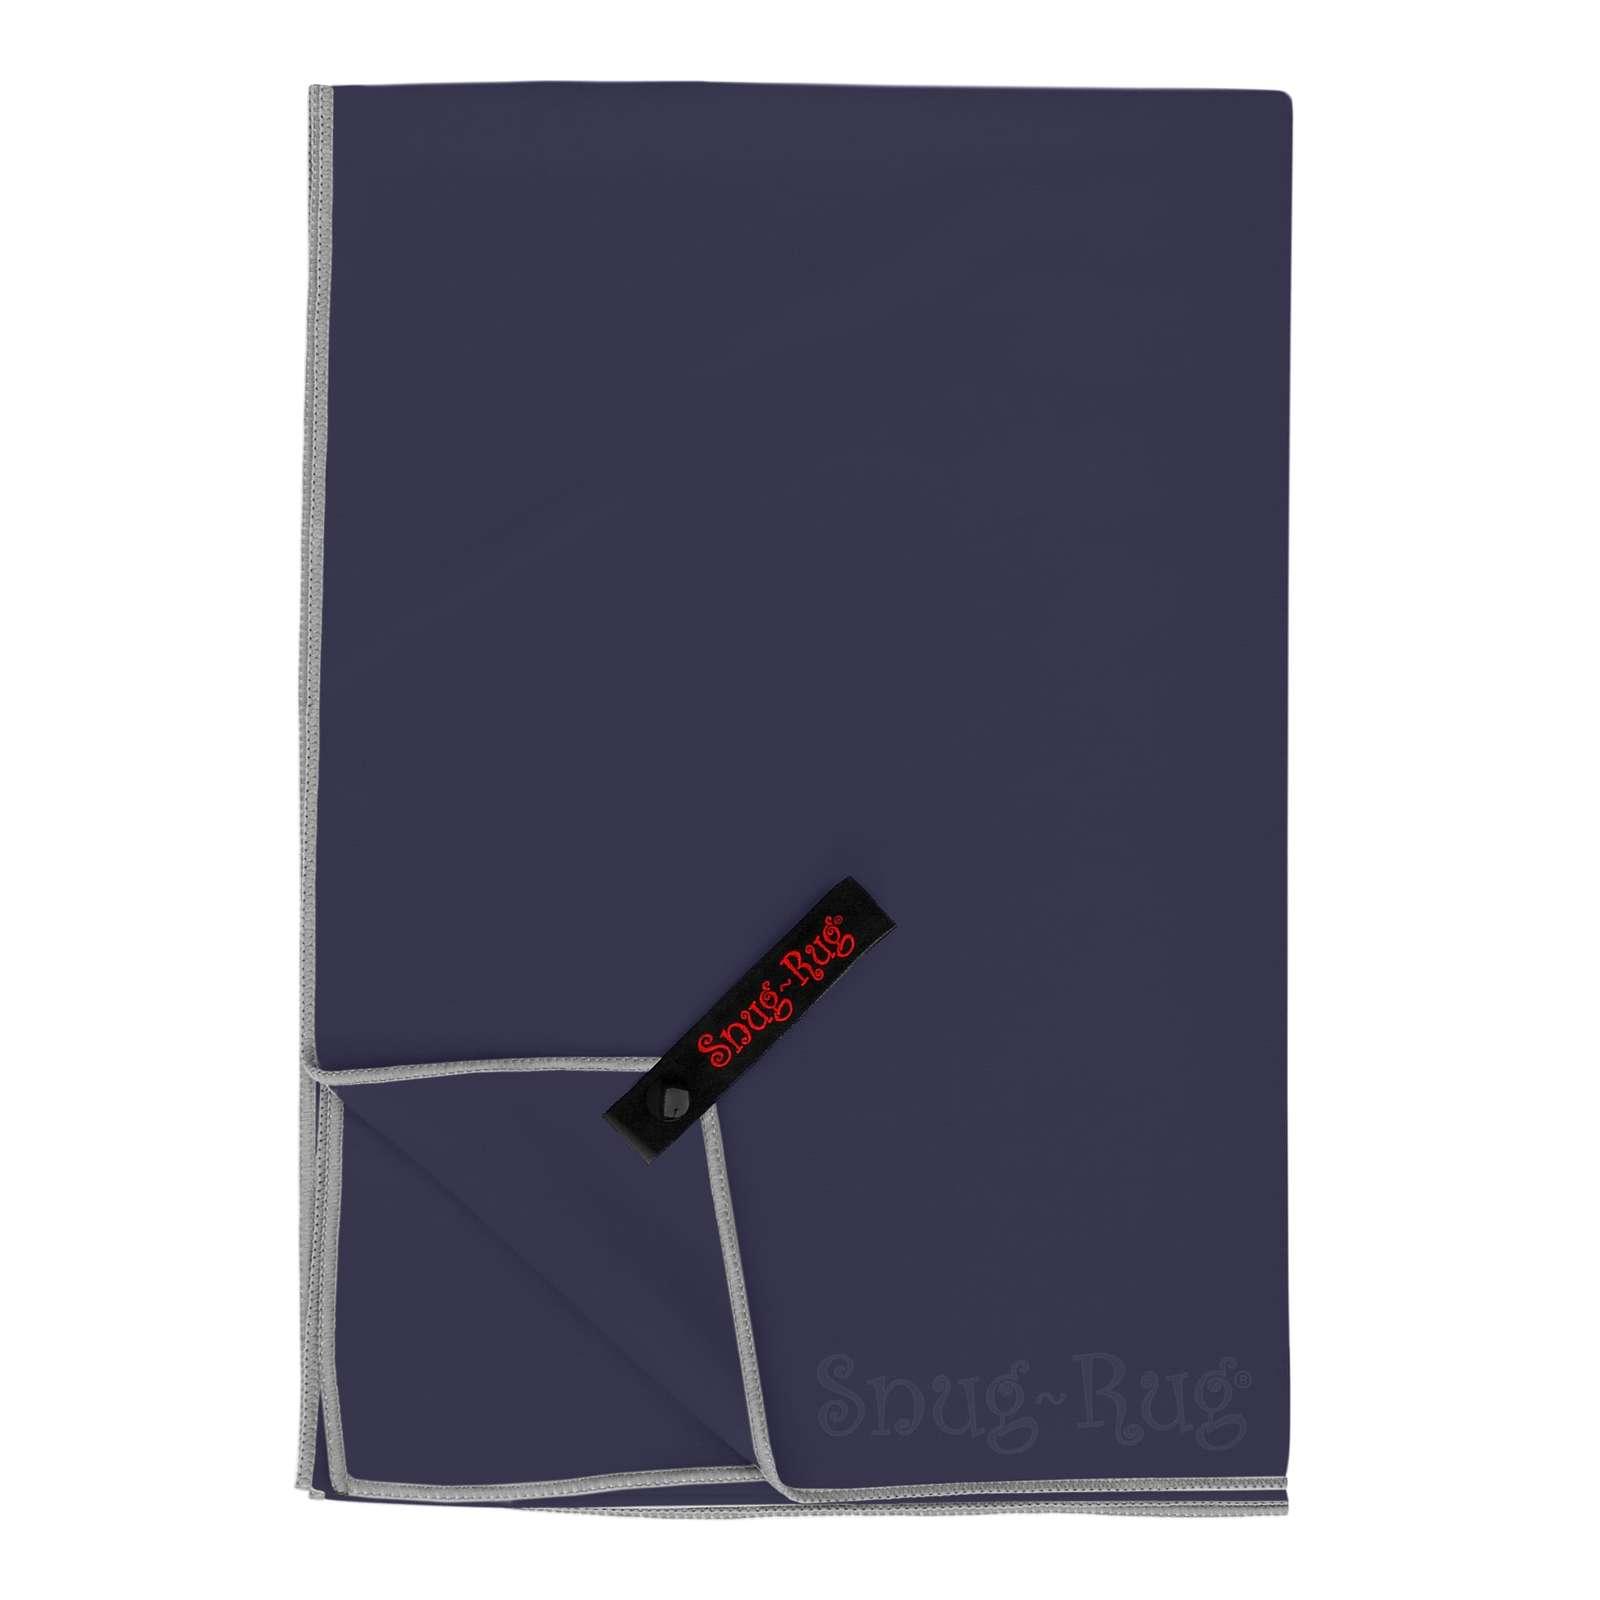 Snug Rug Microfibre Quick Dry Beach Towel - Eclipse Blue (Large) image